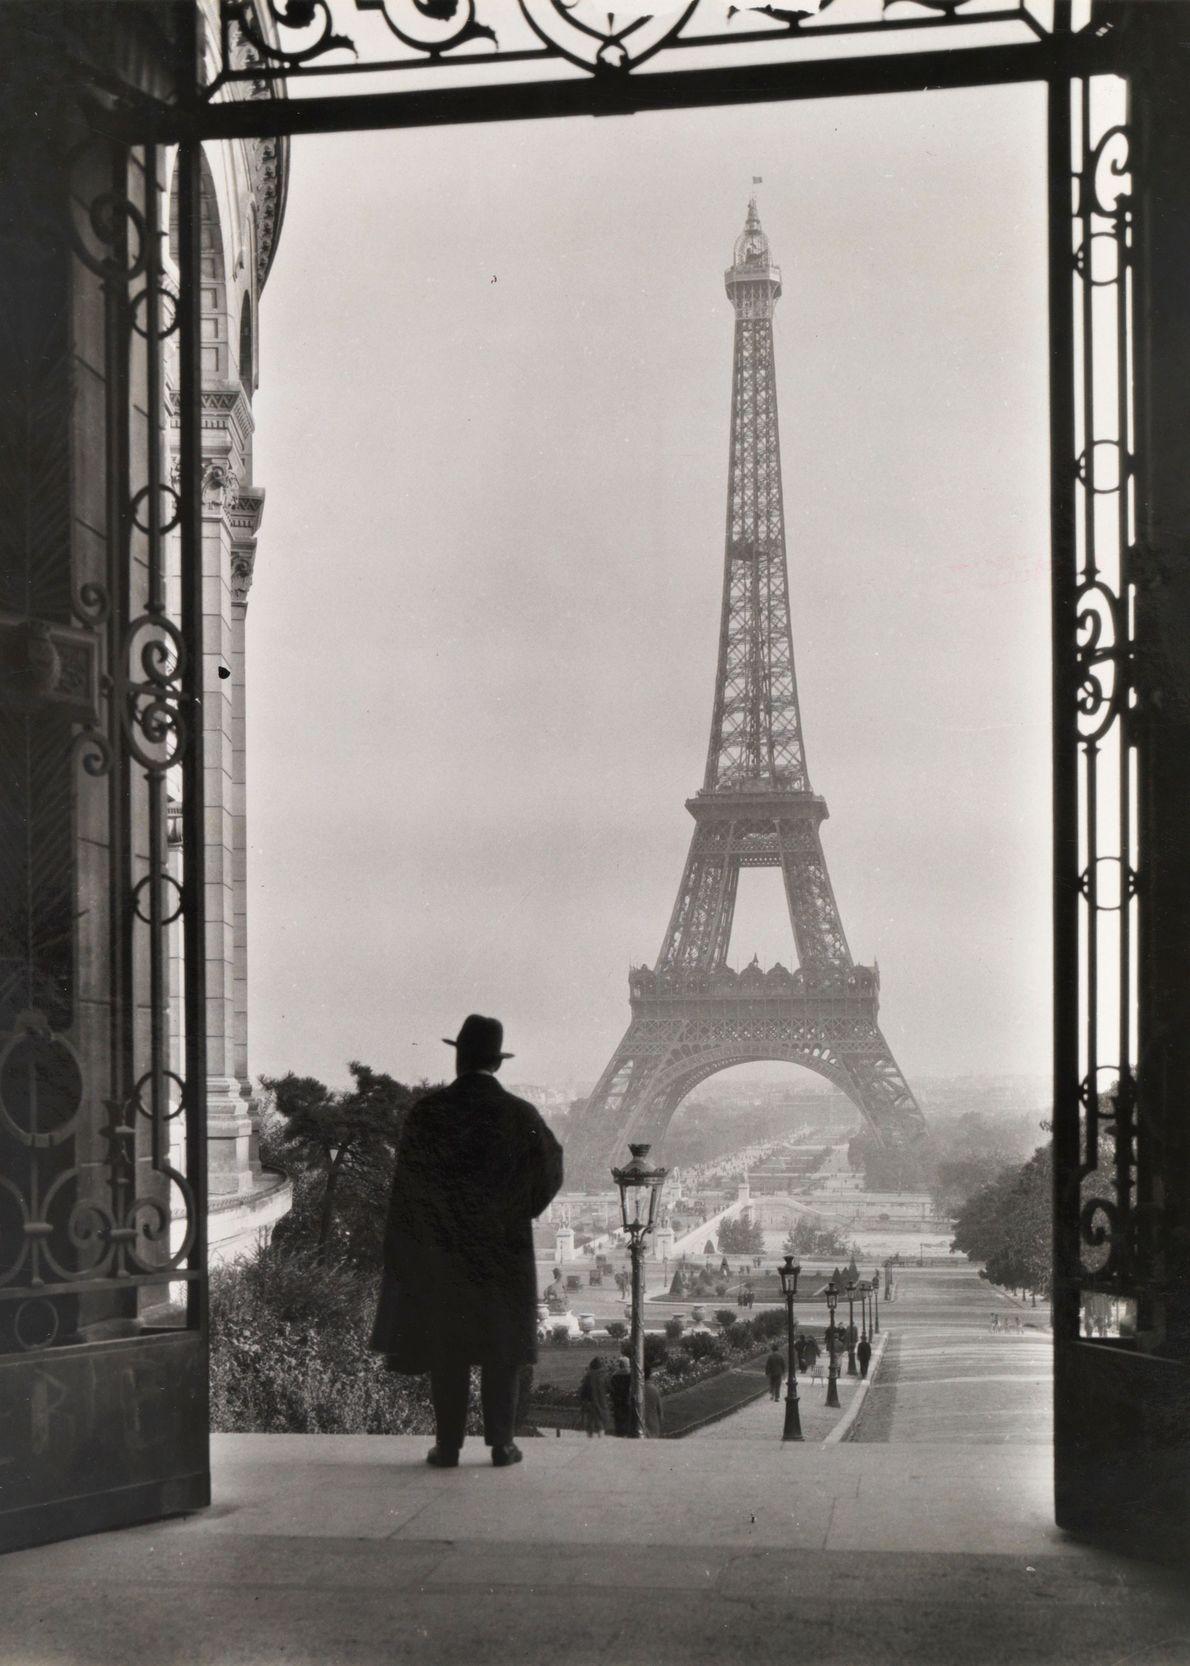 Paris, França, 1929, Torre Eiffel